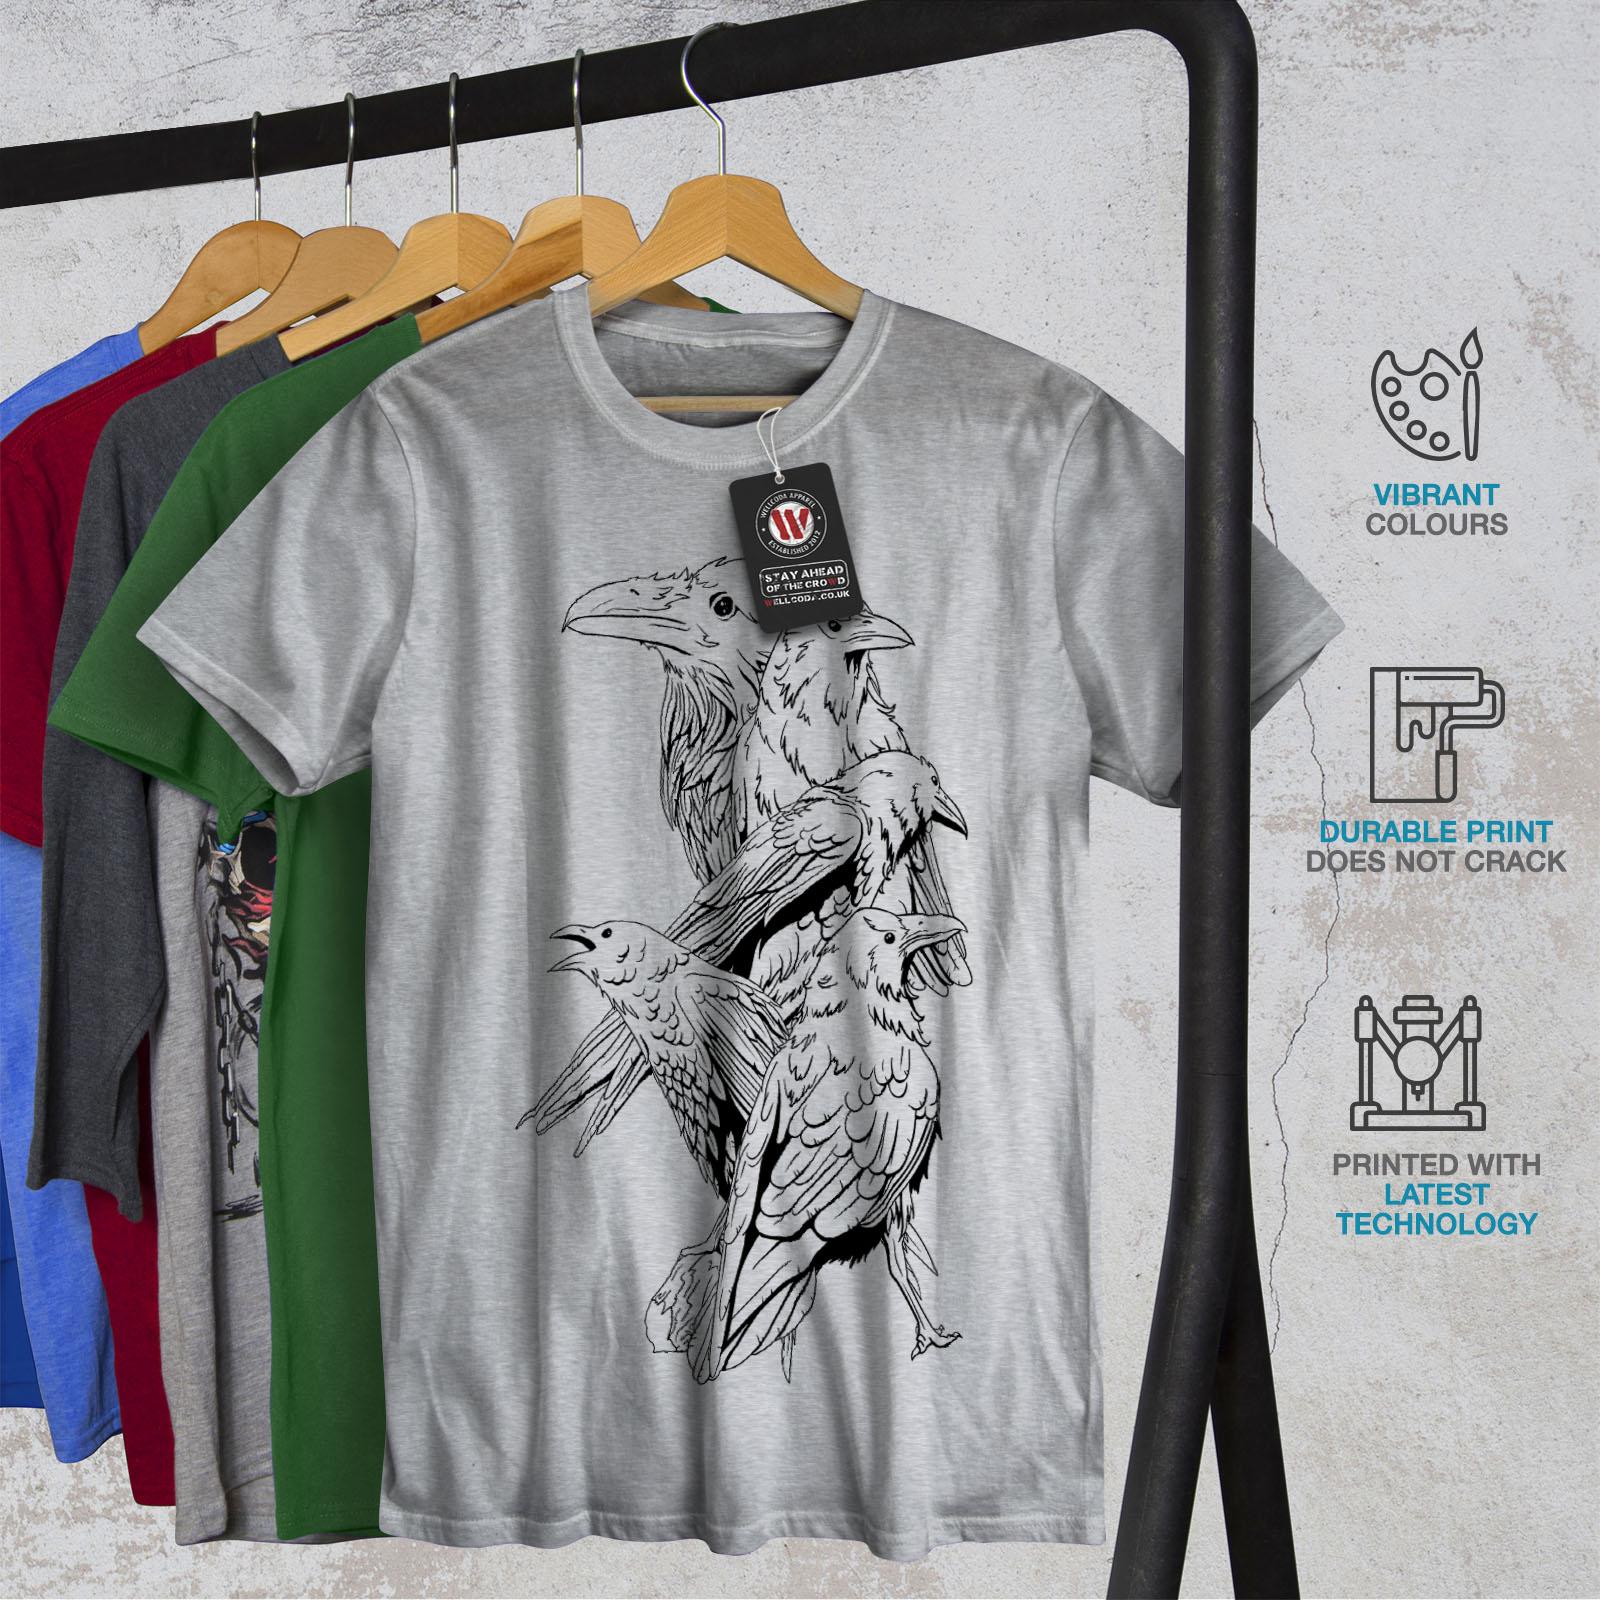 miniature 18 - Wellcoda Four Scary Raven Mens T-shirt, Crow Birds Graphic Design Printed Tee